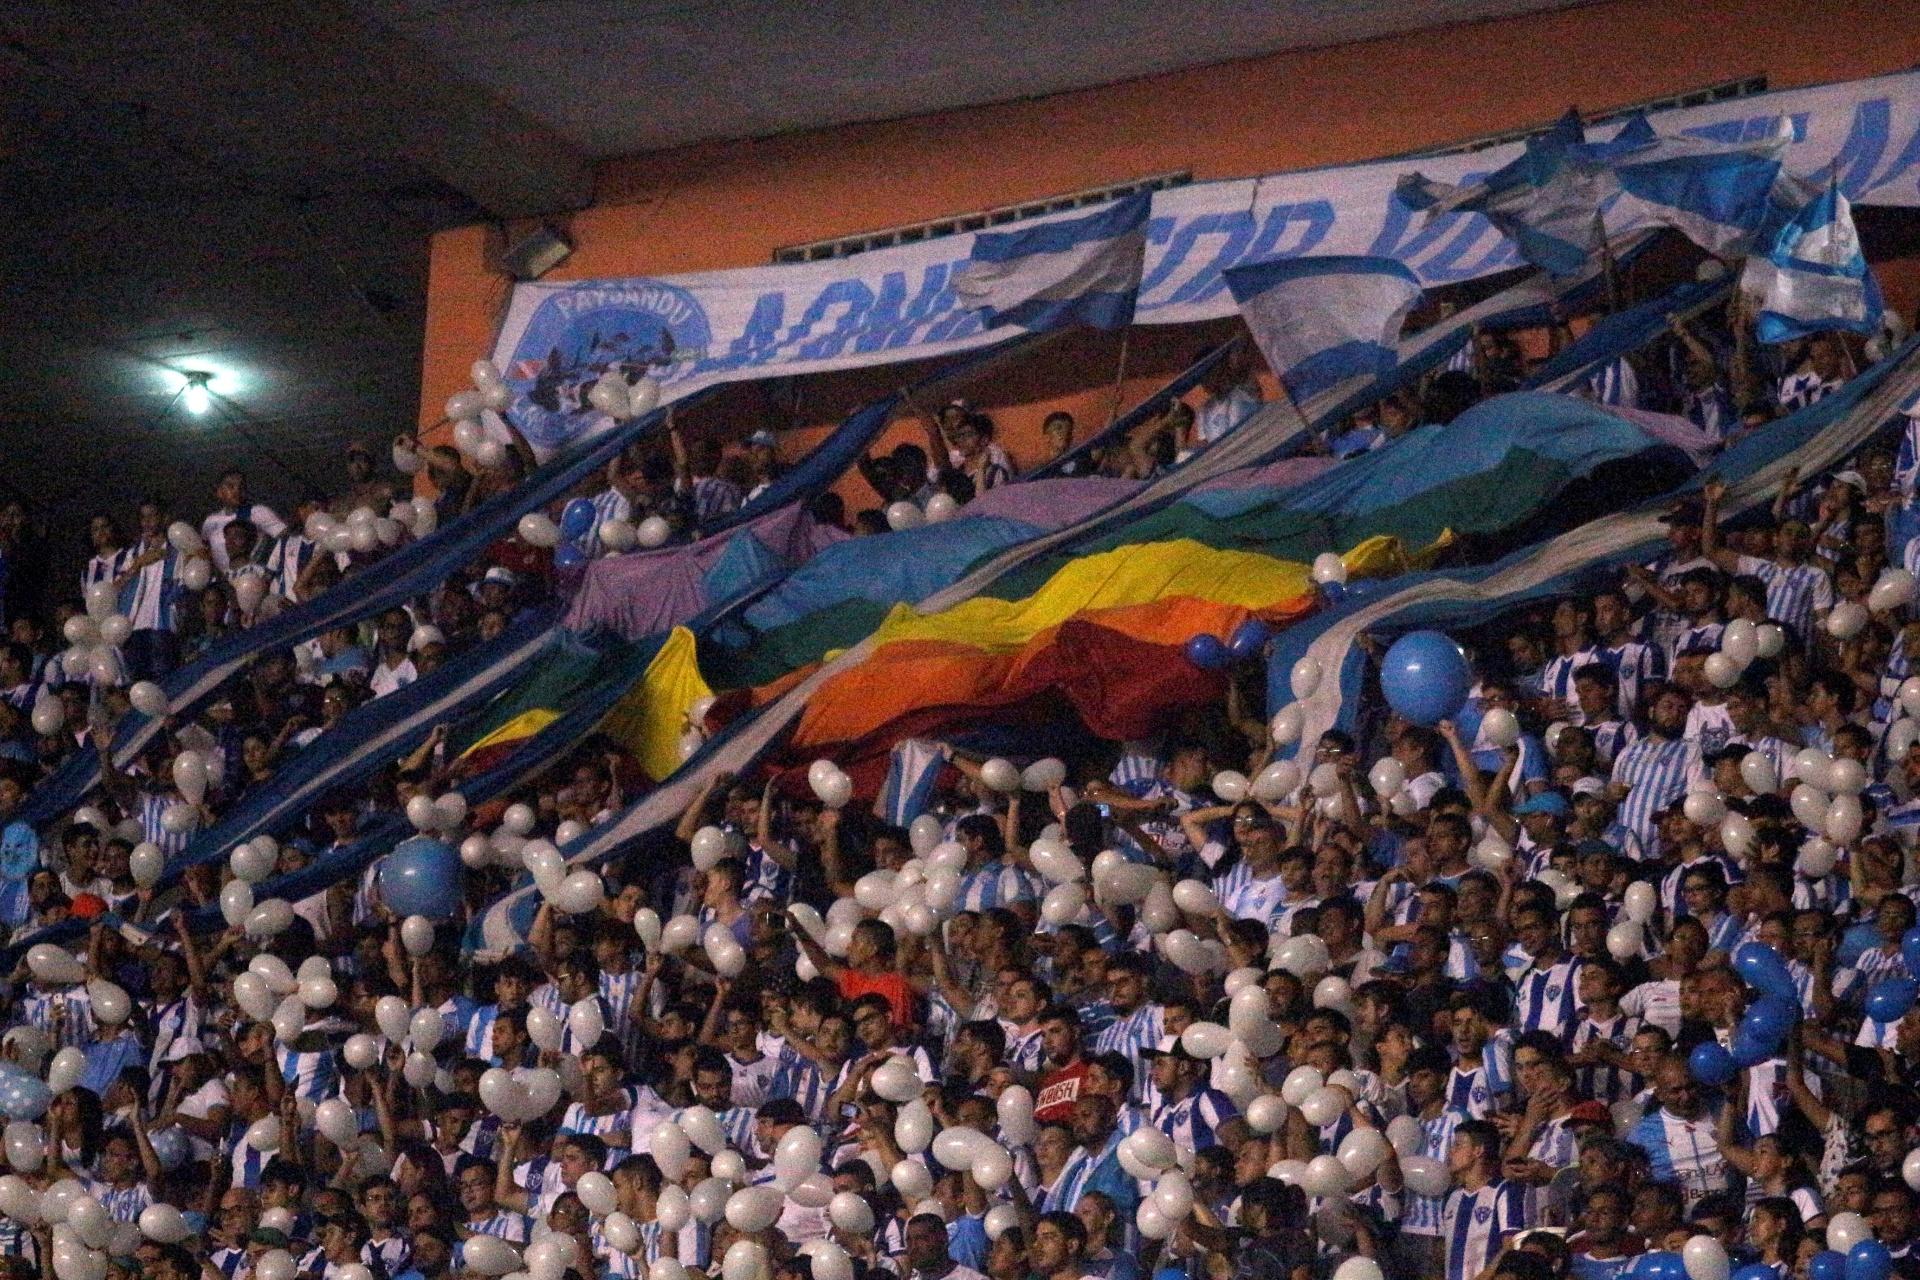 4ba8c508f2f50 Parada gay premia torcida que levou bandeira LGBT a estádio - 17 06 2017 -  UOL Esporte